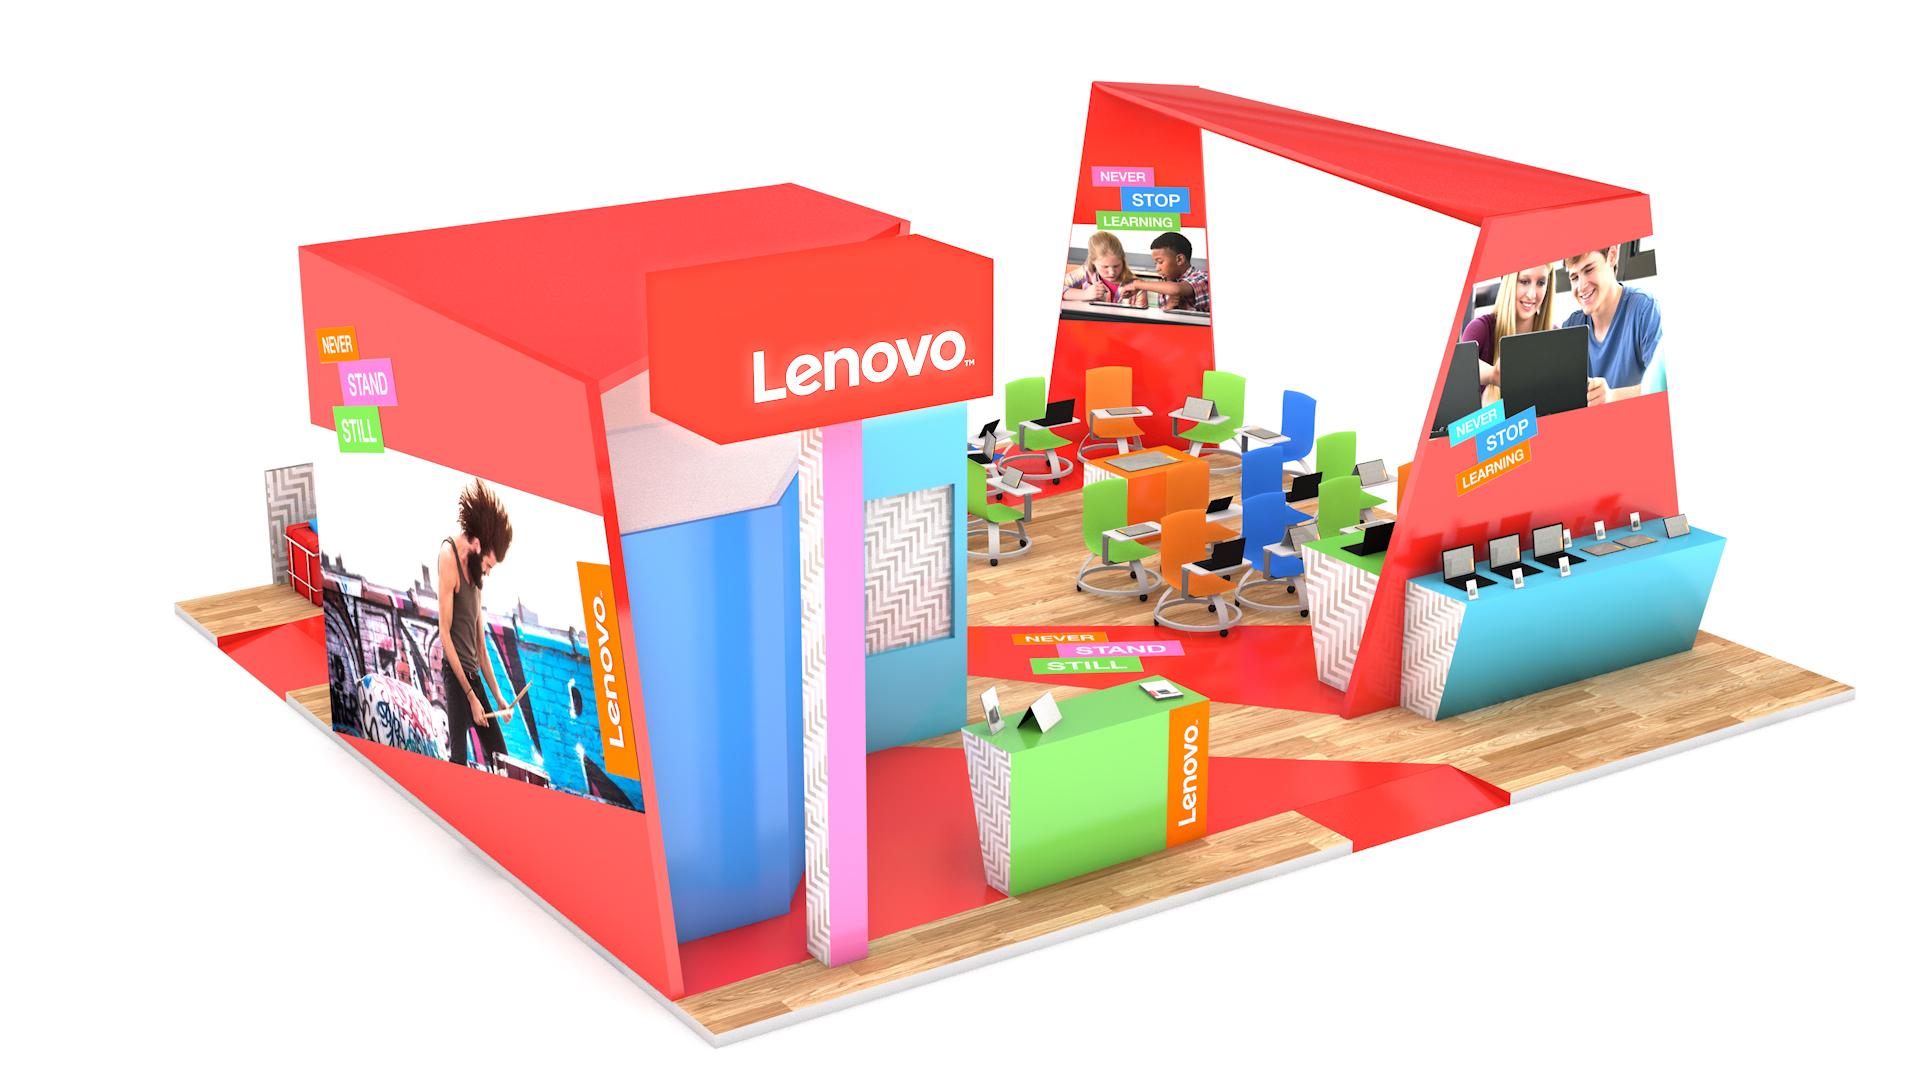 Lenovo / overview